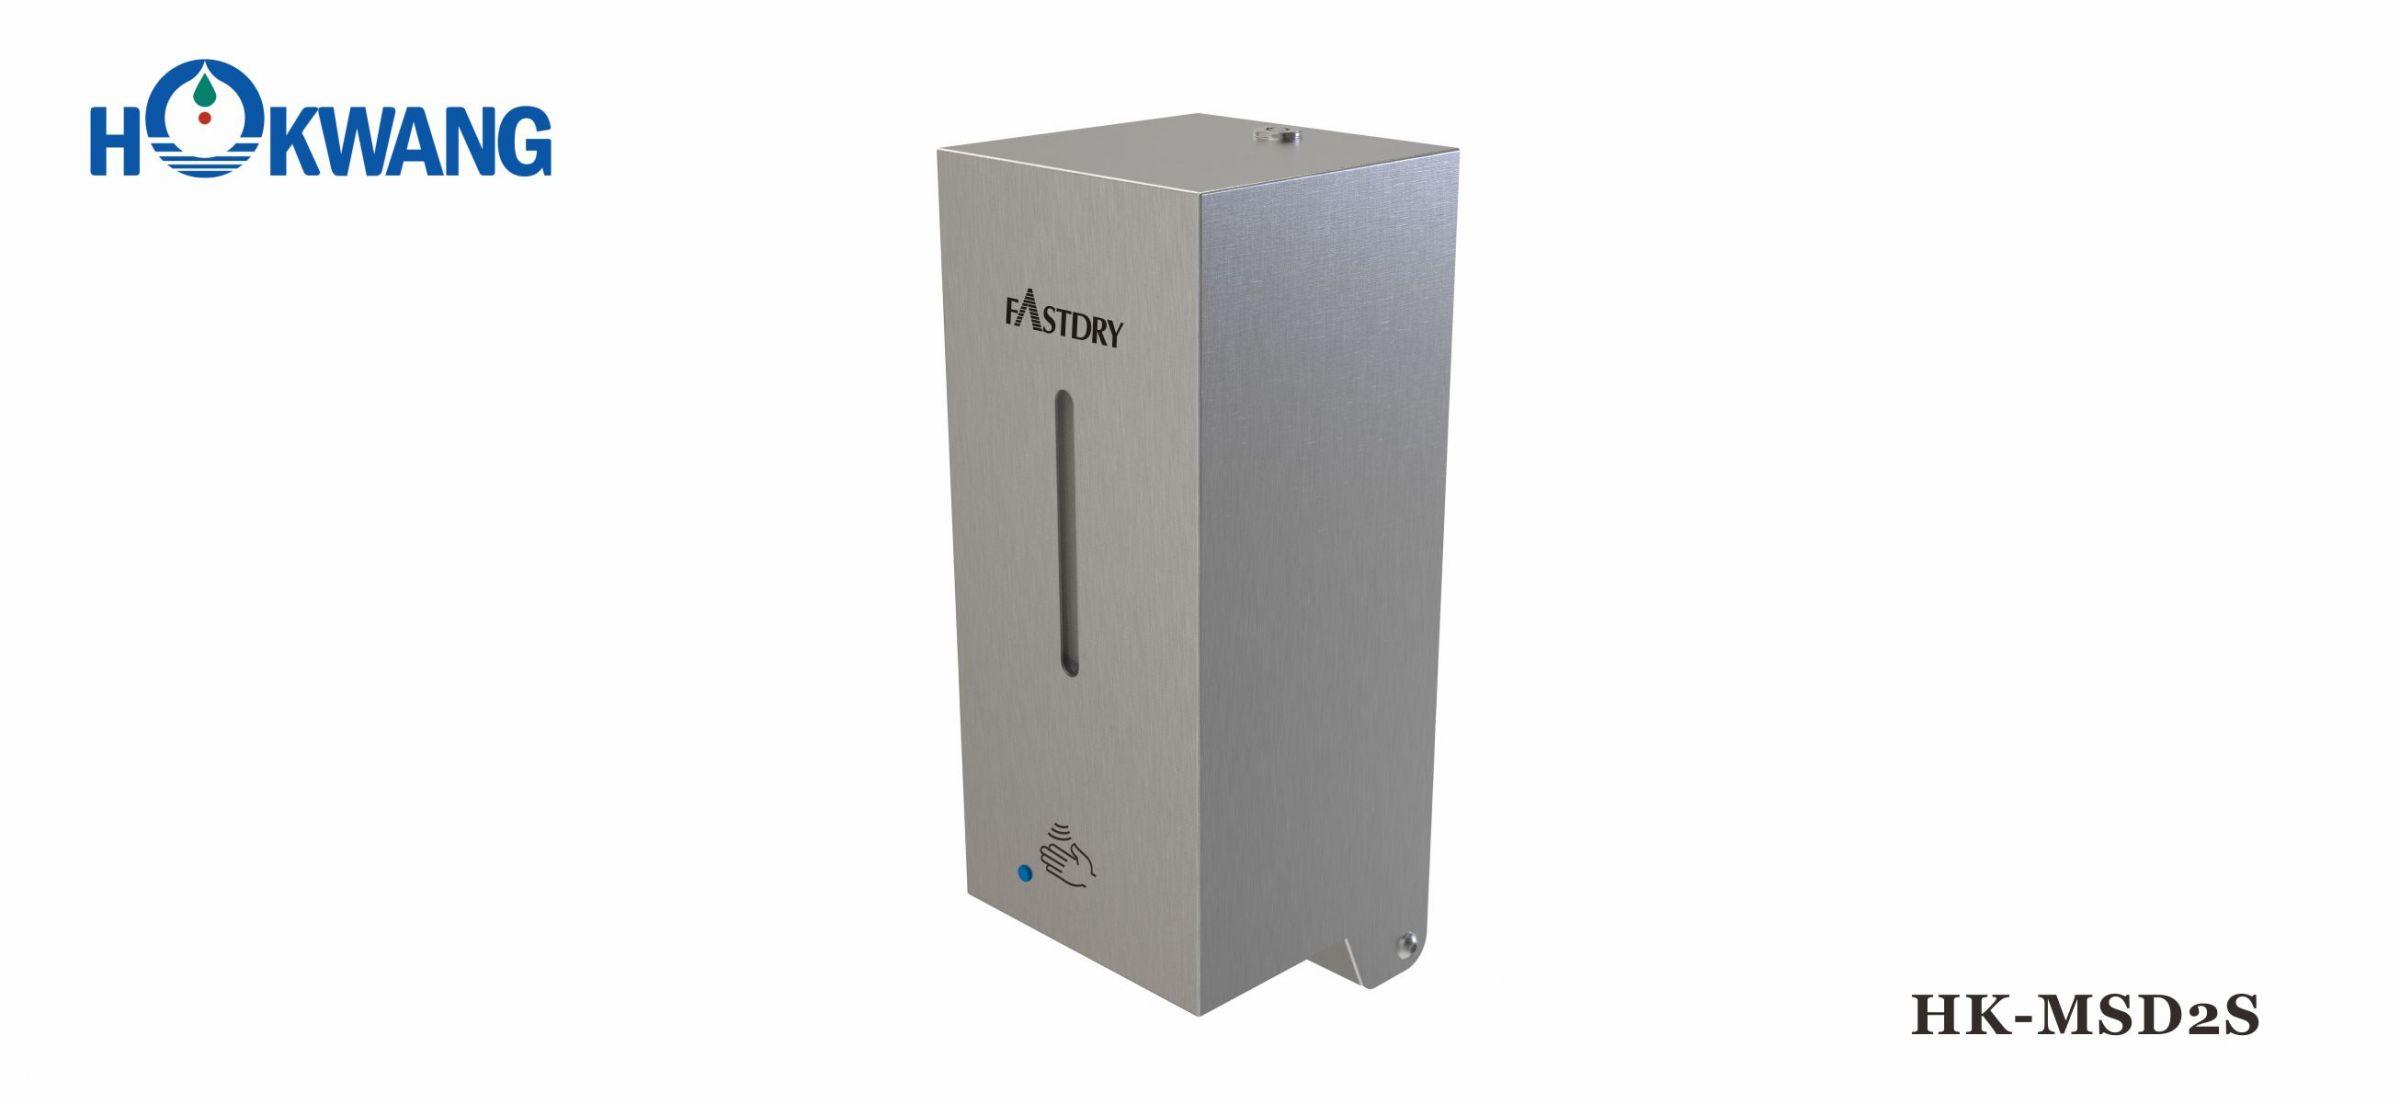 HK-MSD2S Auto Stainless Steel Multi-Function Soap Dispenser